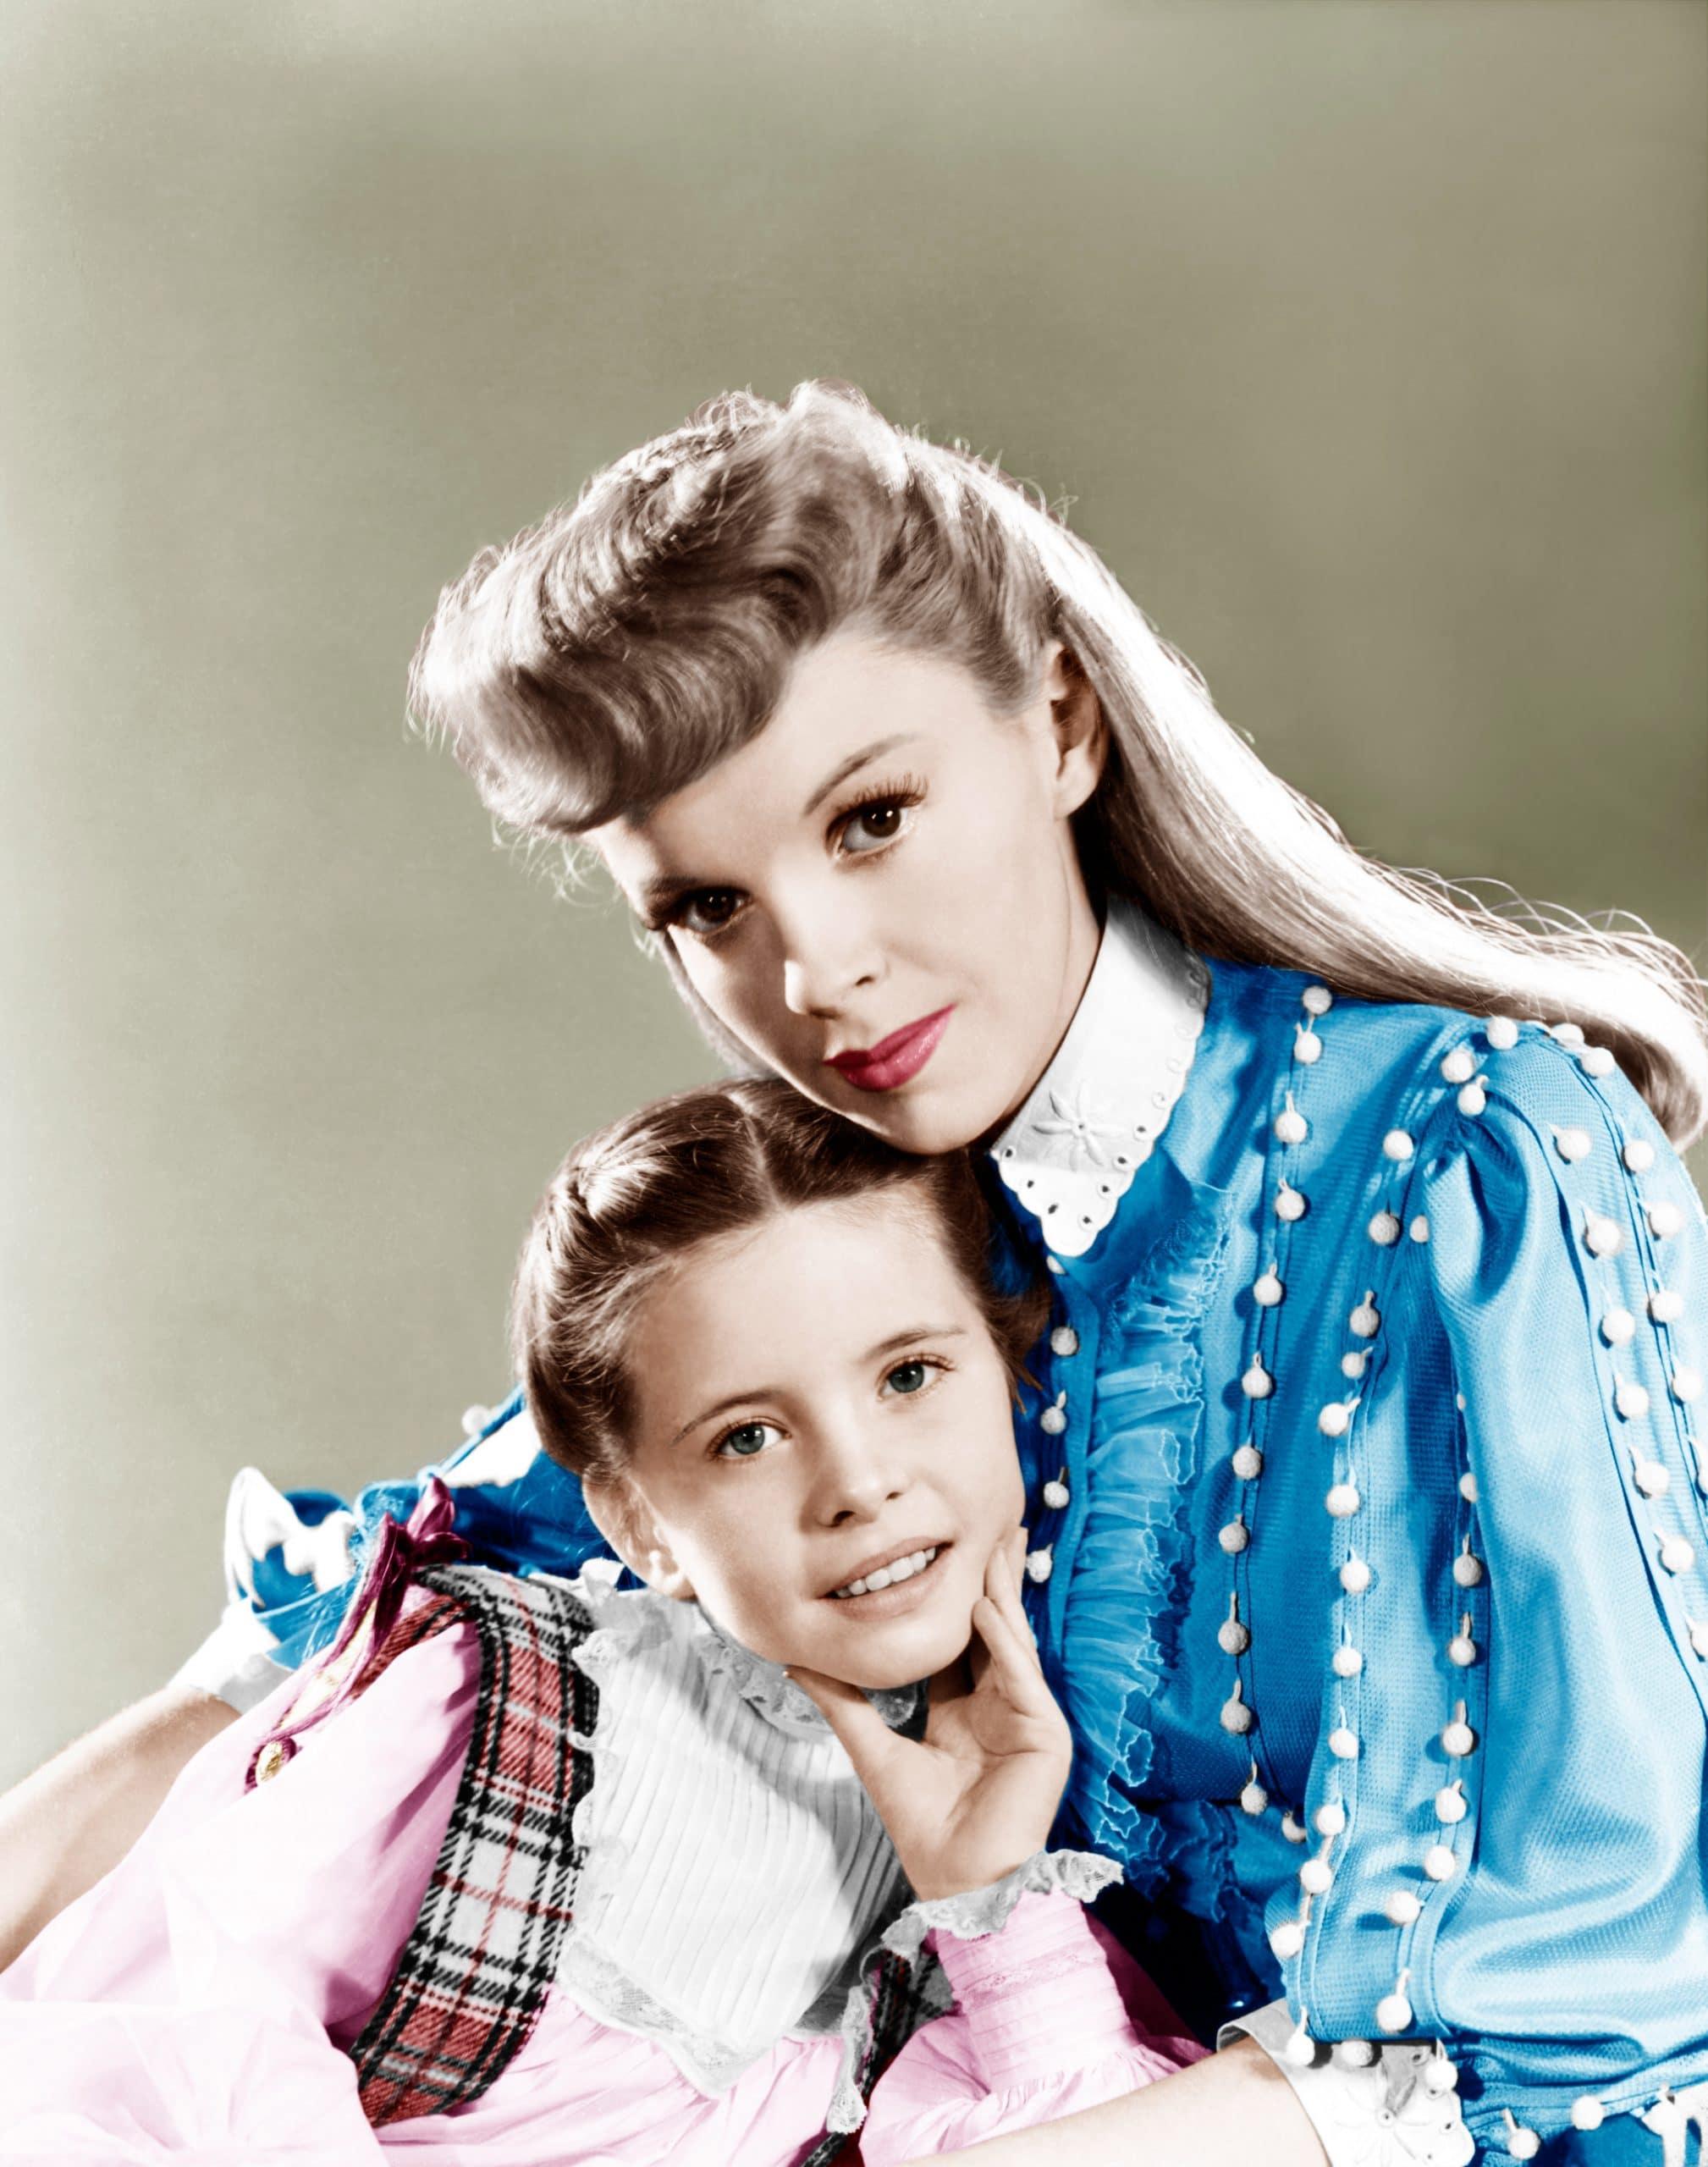 MEET ME IN ST. LOUIS, from left: Margaret O'Brien, Judy Garland, 1944